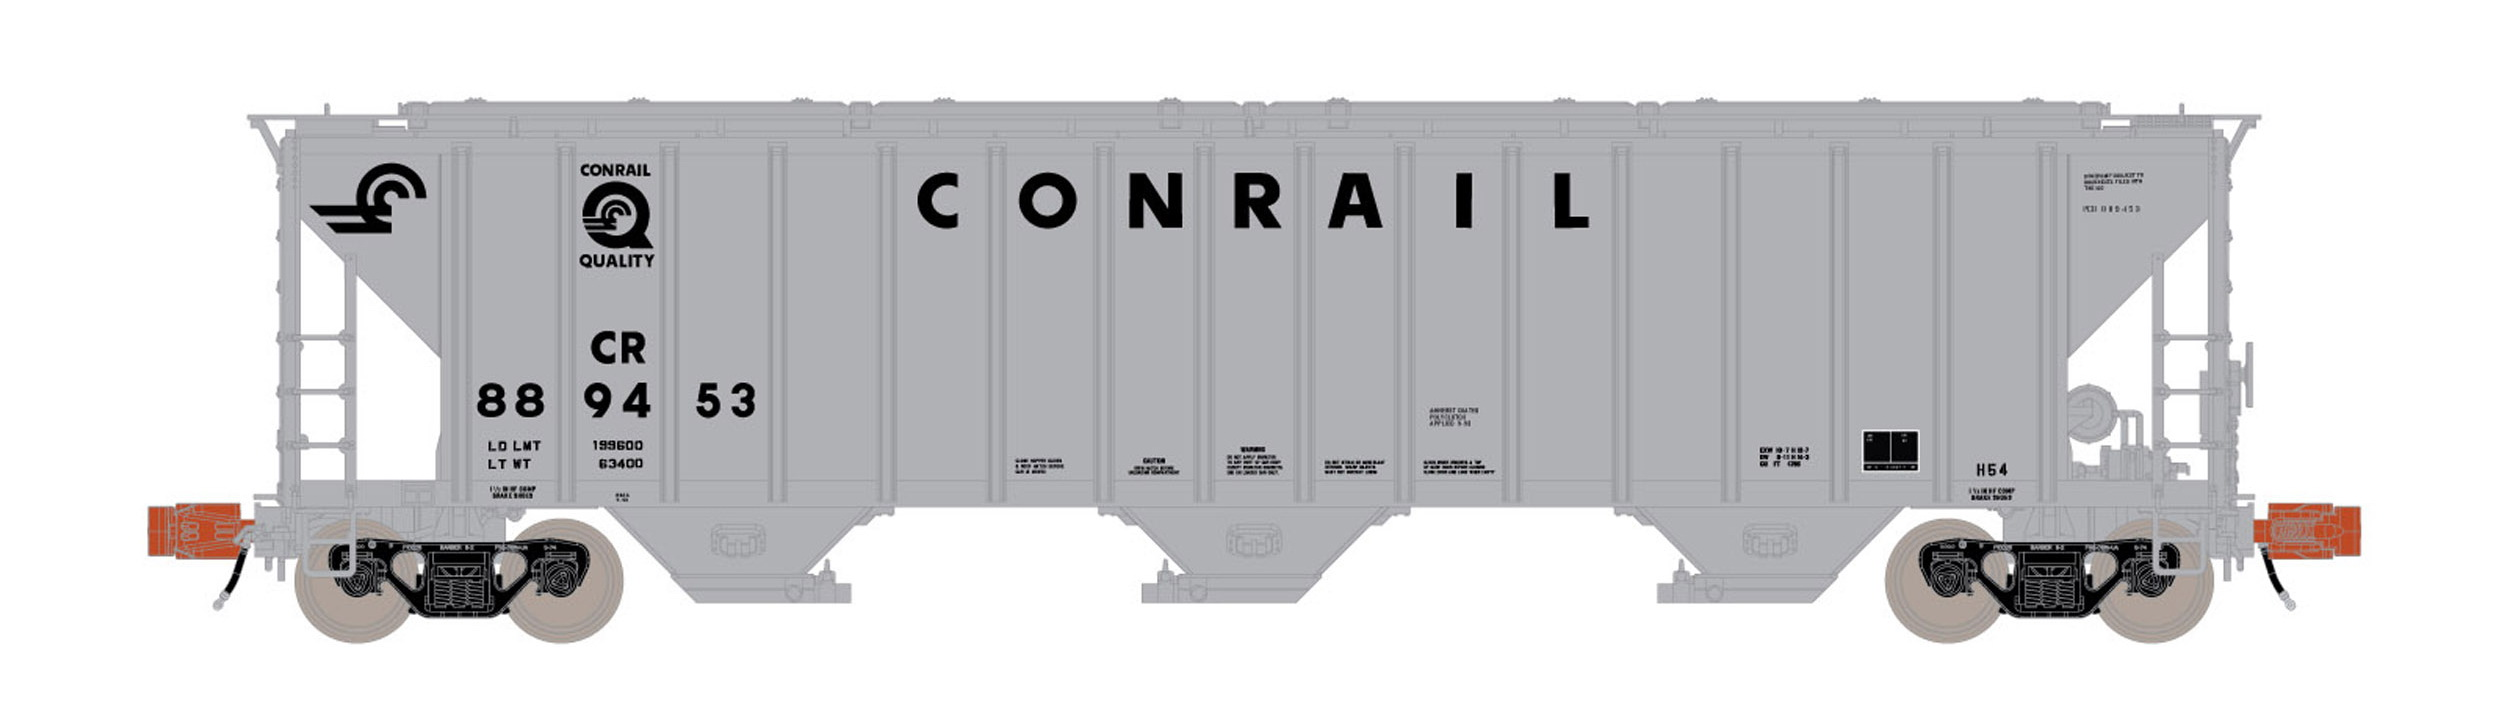 N Scale - ScaleTrains.com - SXT31822 - Covered Hopper, 3-Bay, PS-2 - Conrail - 889453